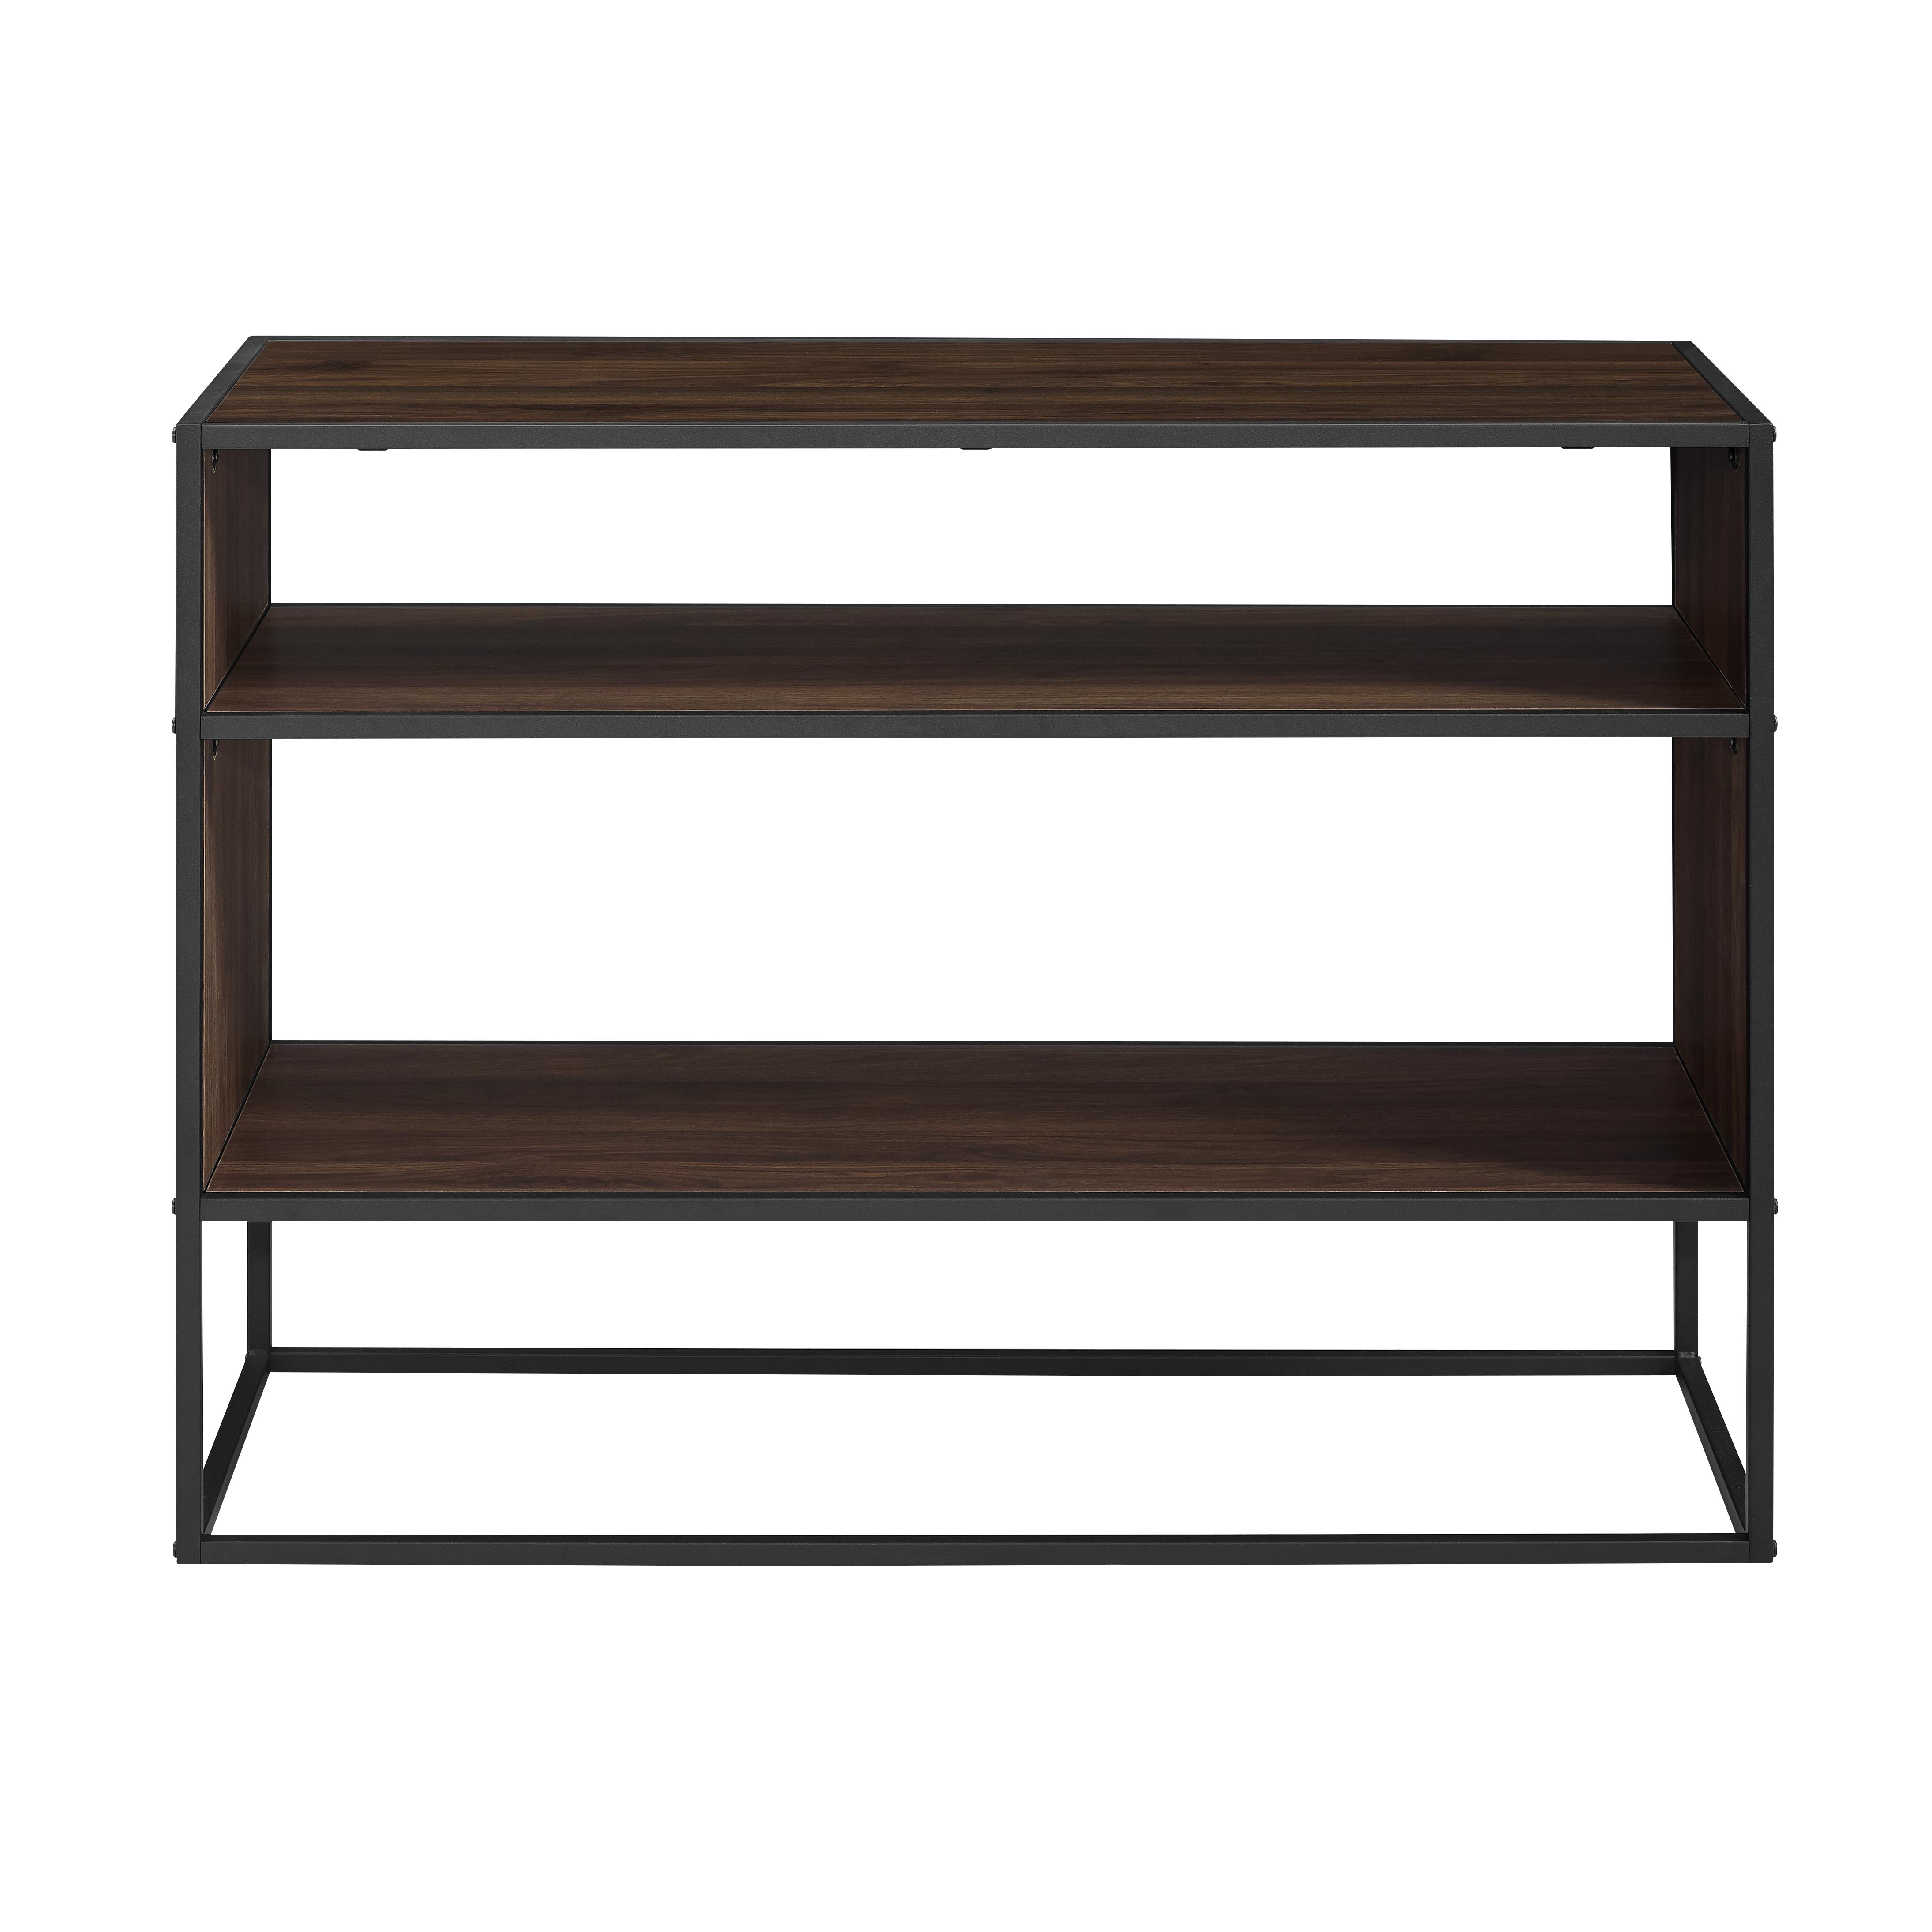 "40"" Rustic Urban Industrial Metal and Wood Open Shelf Storage TV Stand Media Console Table - Dark Walnut"